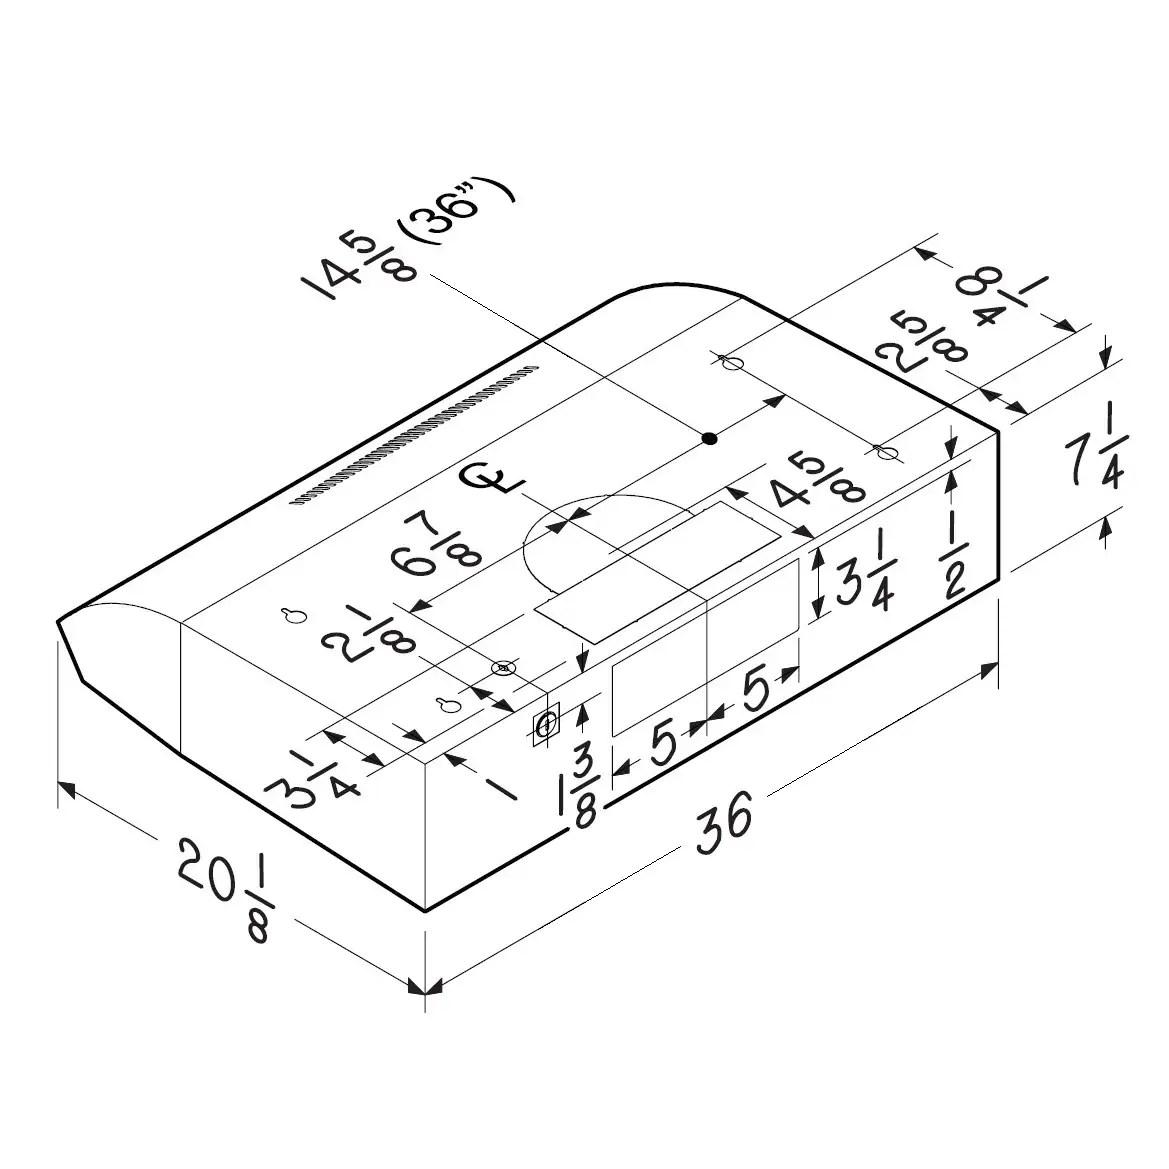 broan range hood wiring diagram saturn sc2 allure qs2 replacement